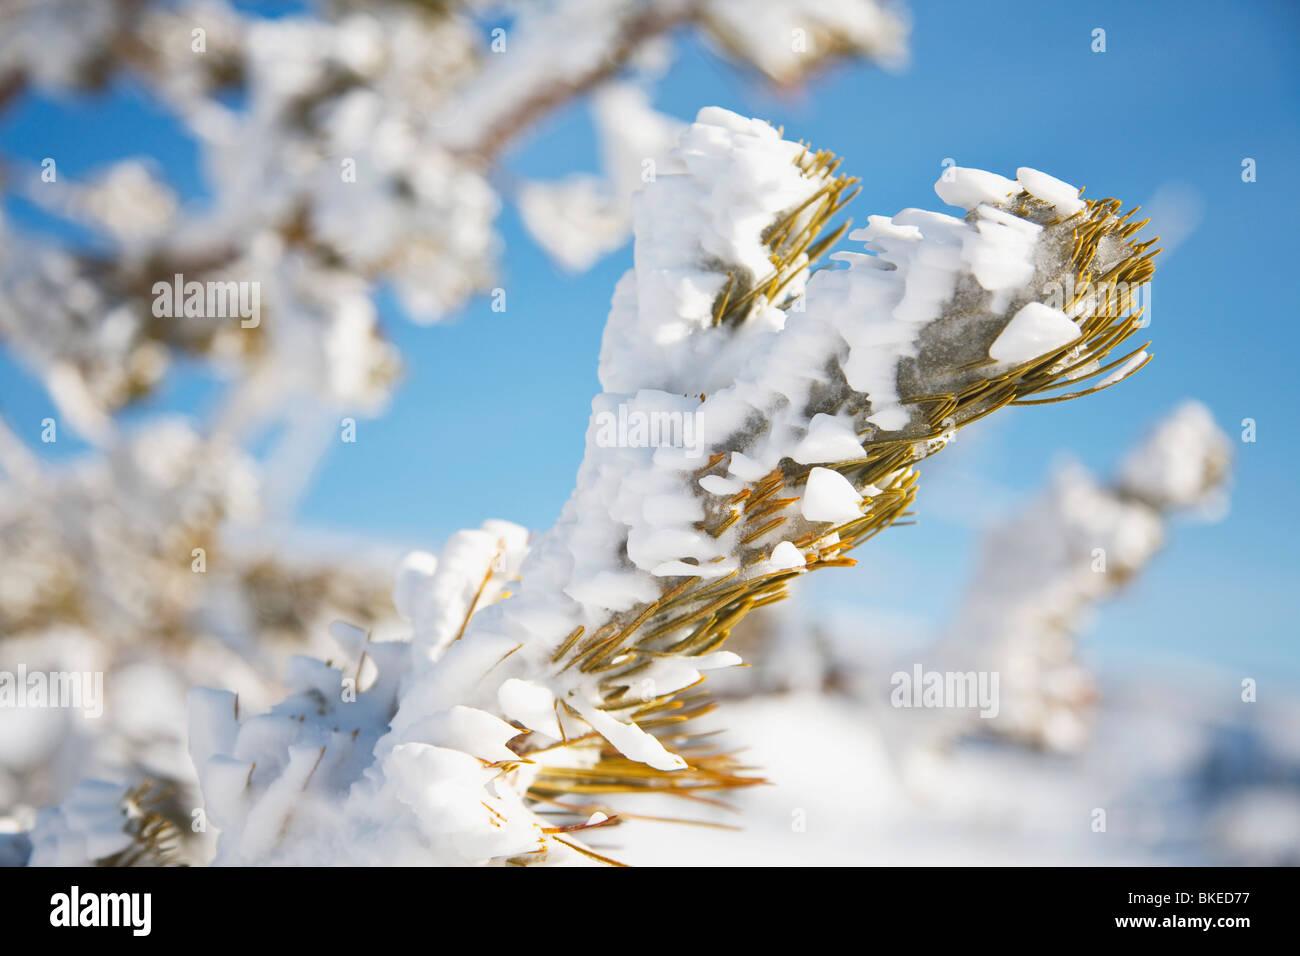 Snow On A Tree - Stock Image